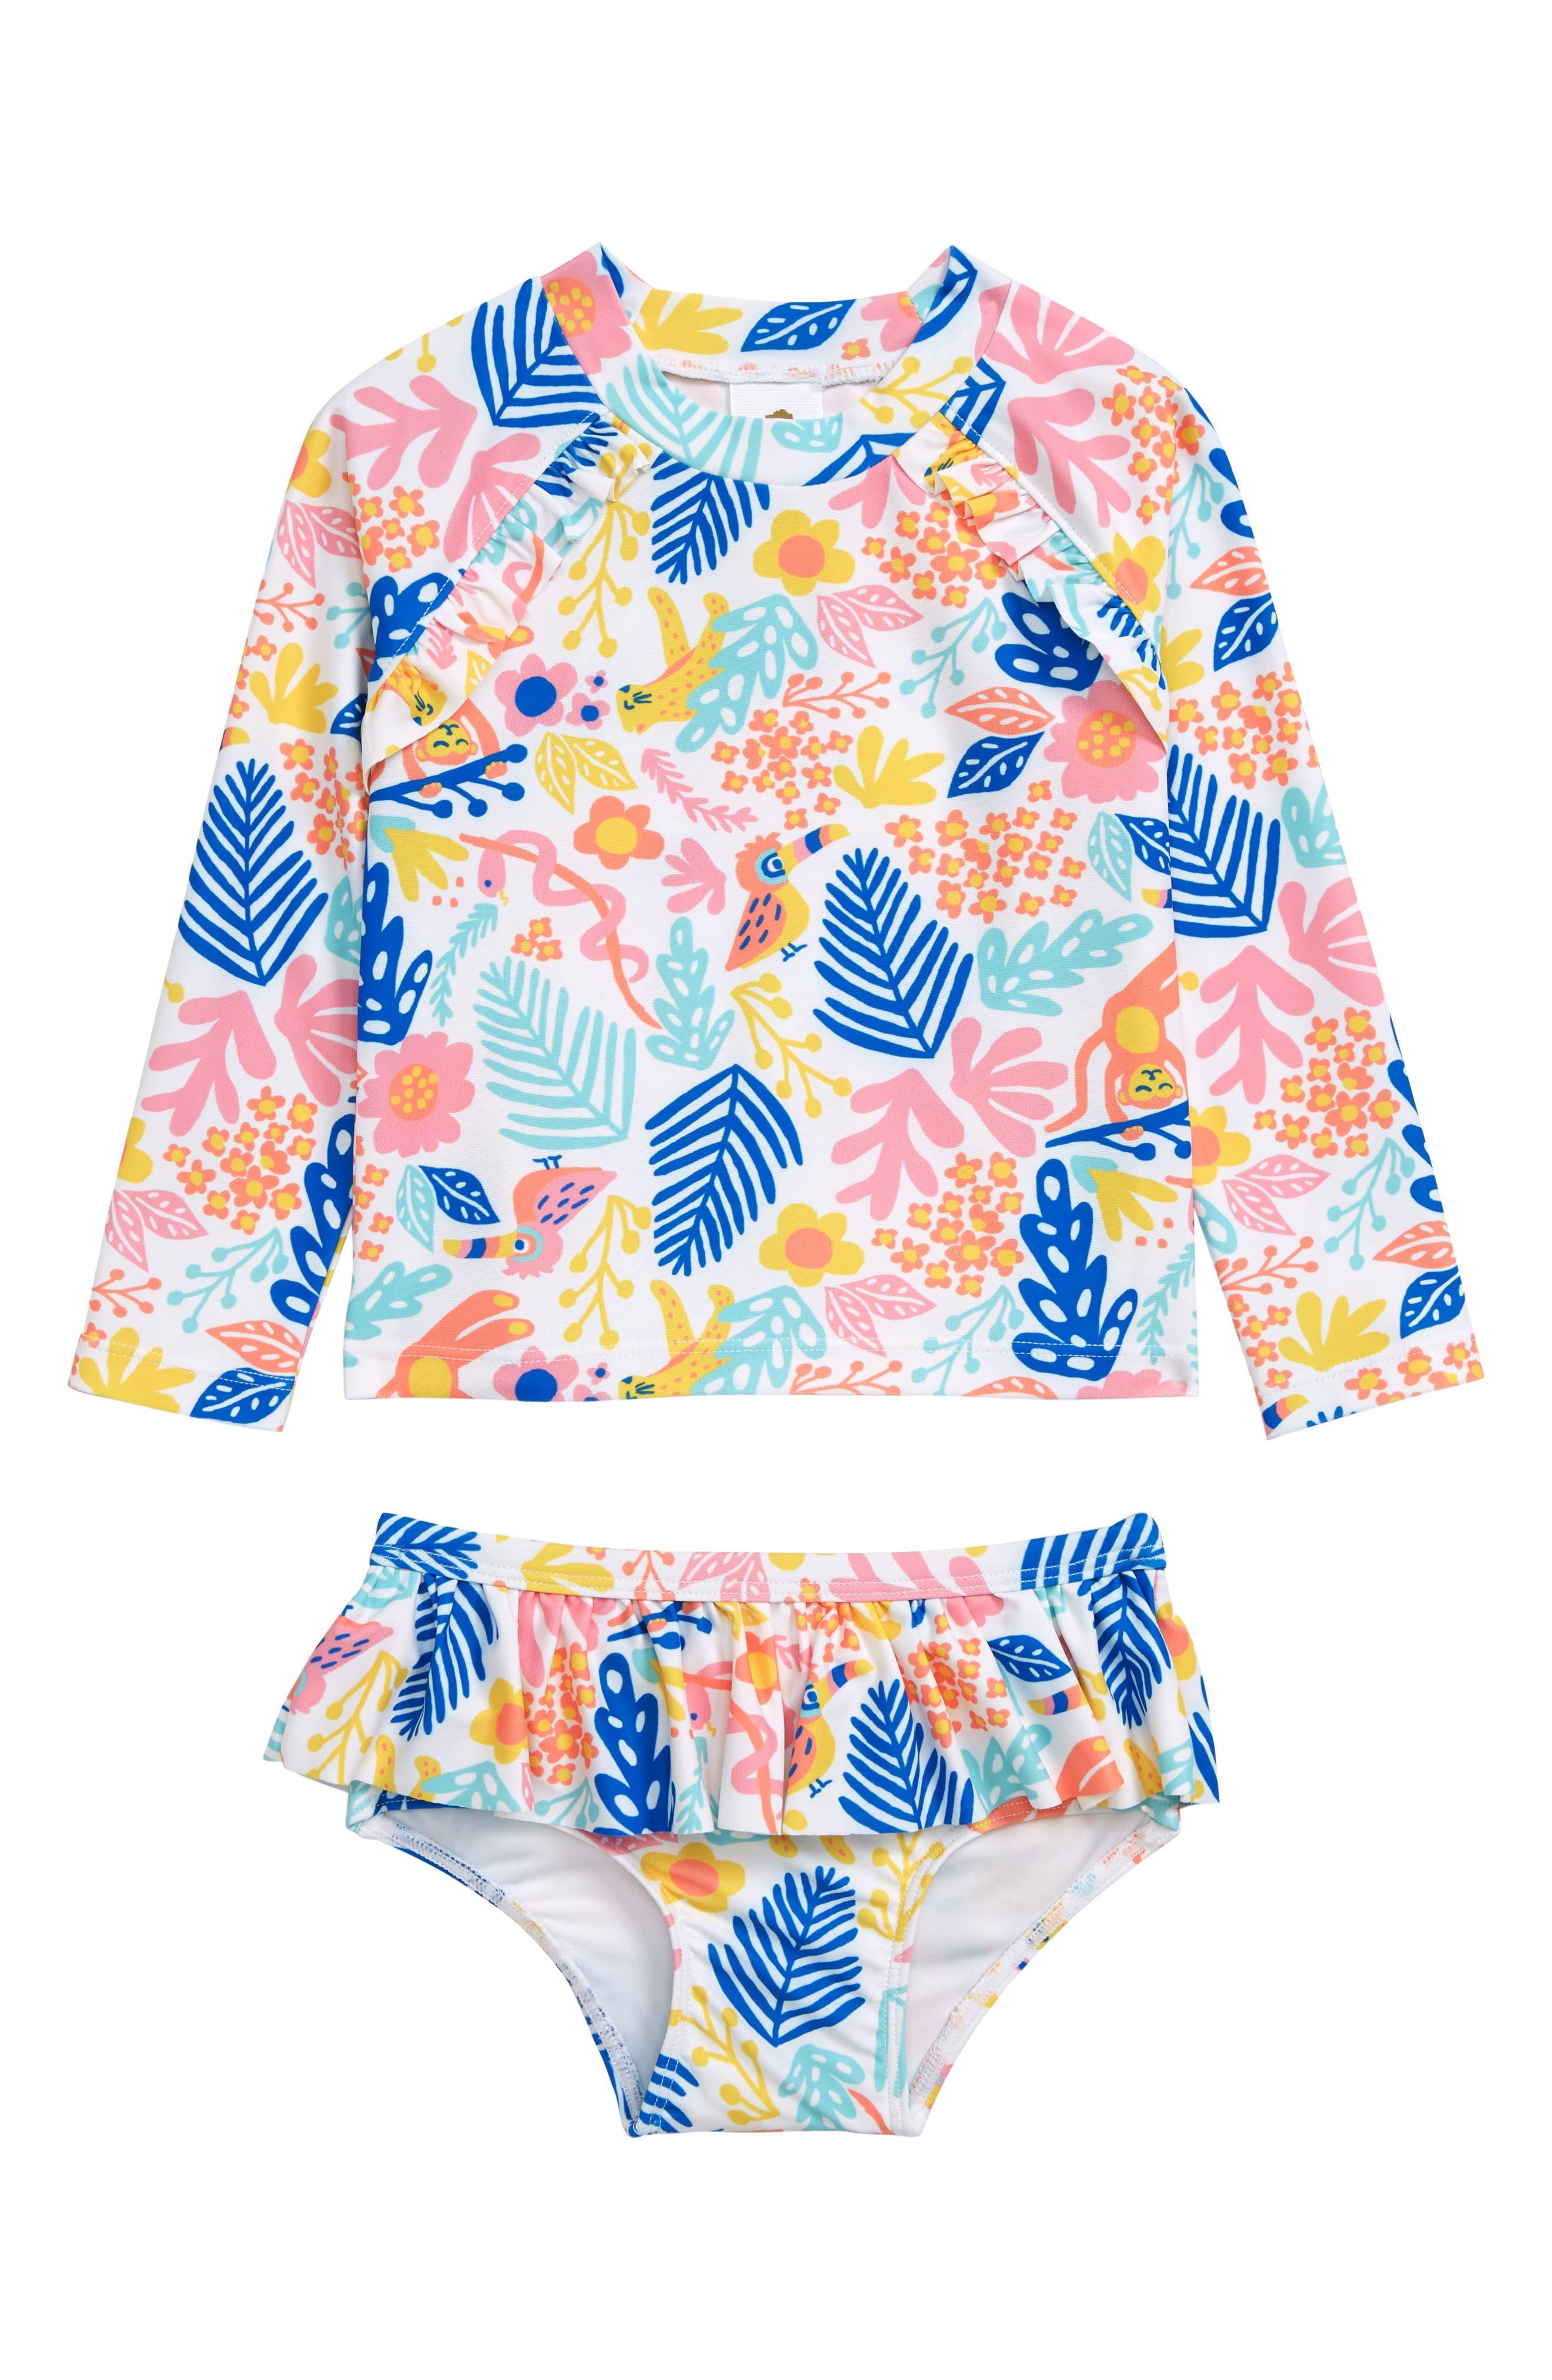 831a189fd45 Infant Girl's Tucker + Tate Two-Piece Ruffle Rashguard Swimsuit, White